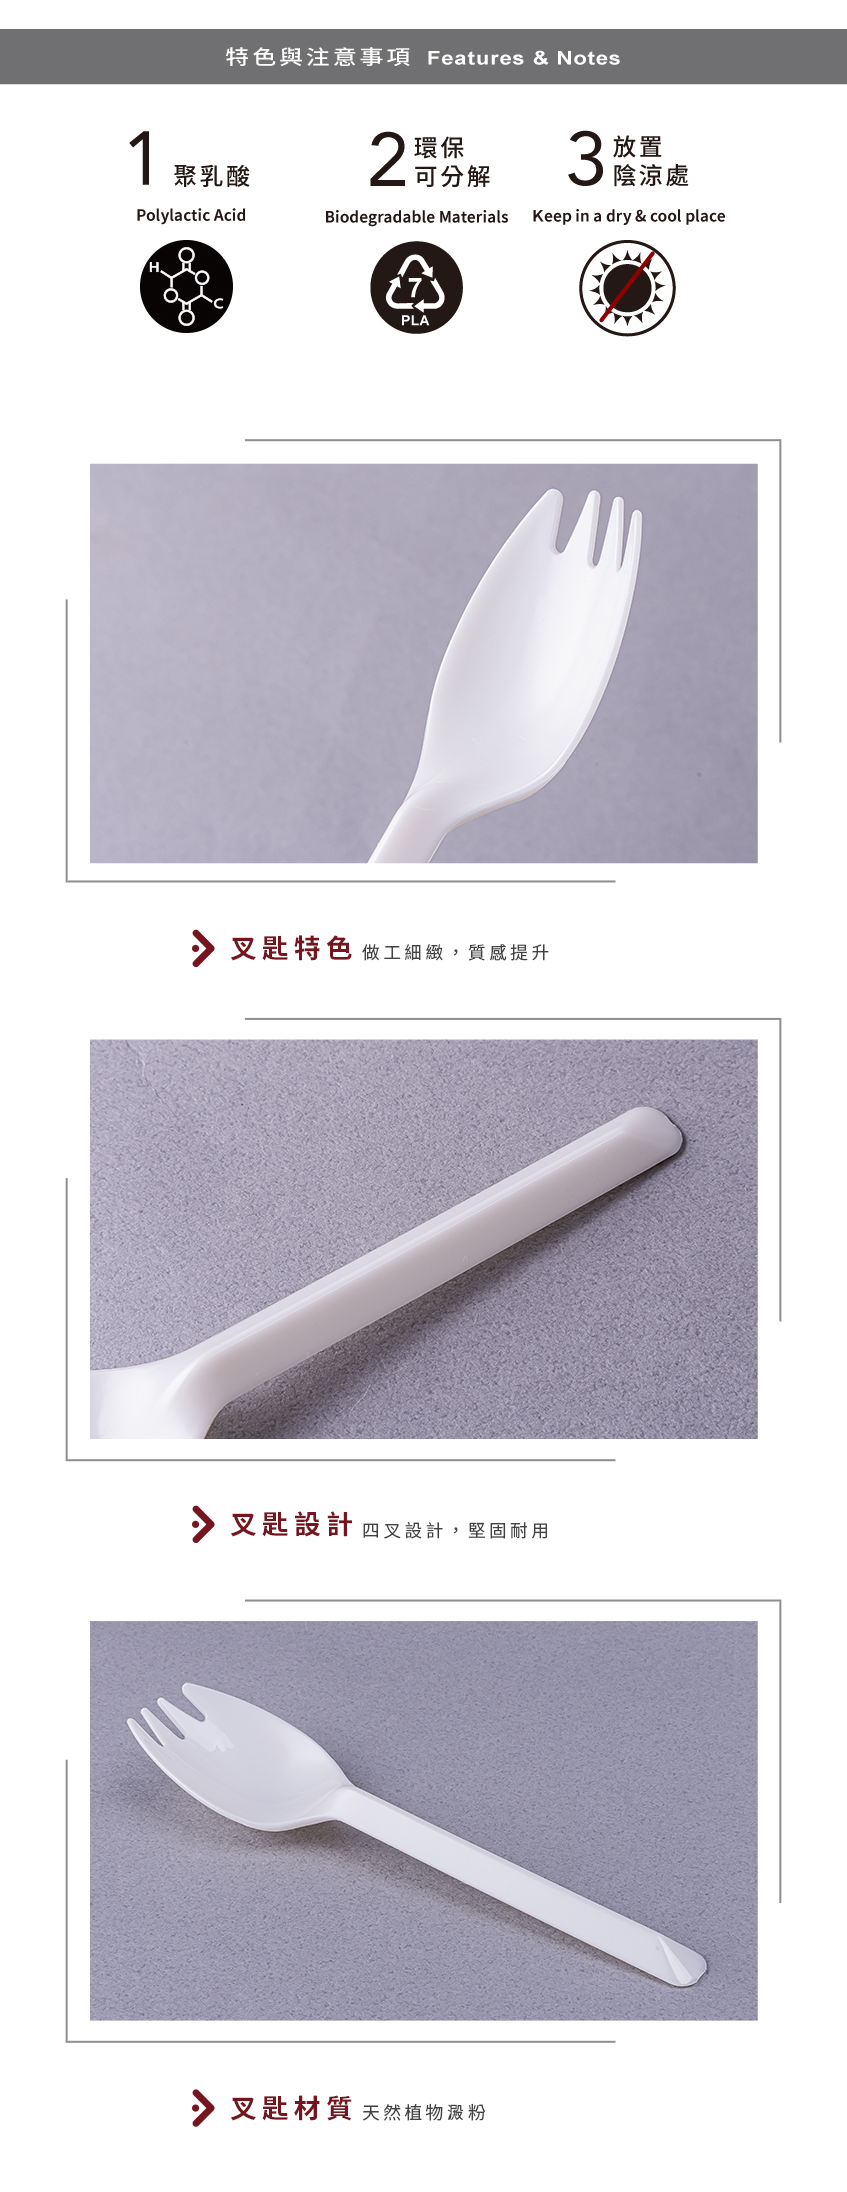 CPLA叉匙 白 環保 可分解 一次性塑膠叉匙 沙拉叉 剉冰匙 彩色冰砂湯匙 冰淇淋匙 三角柄